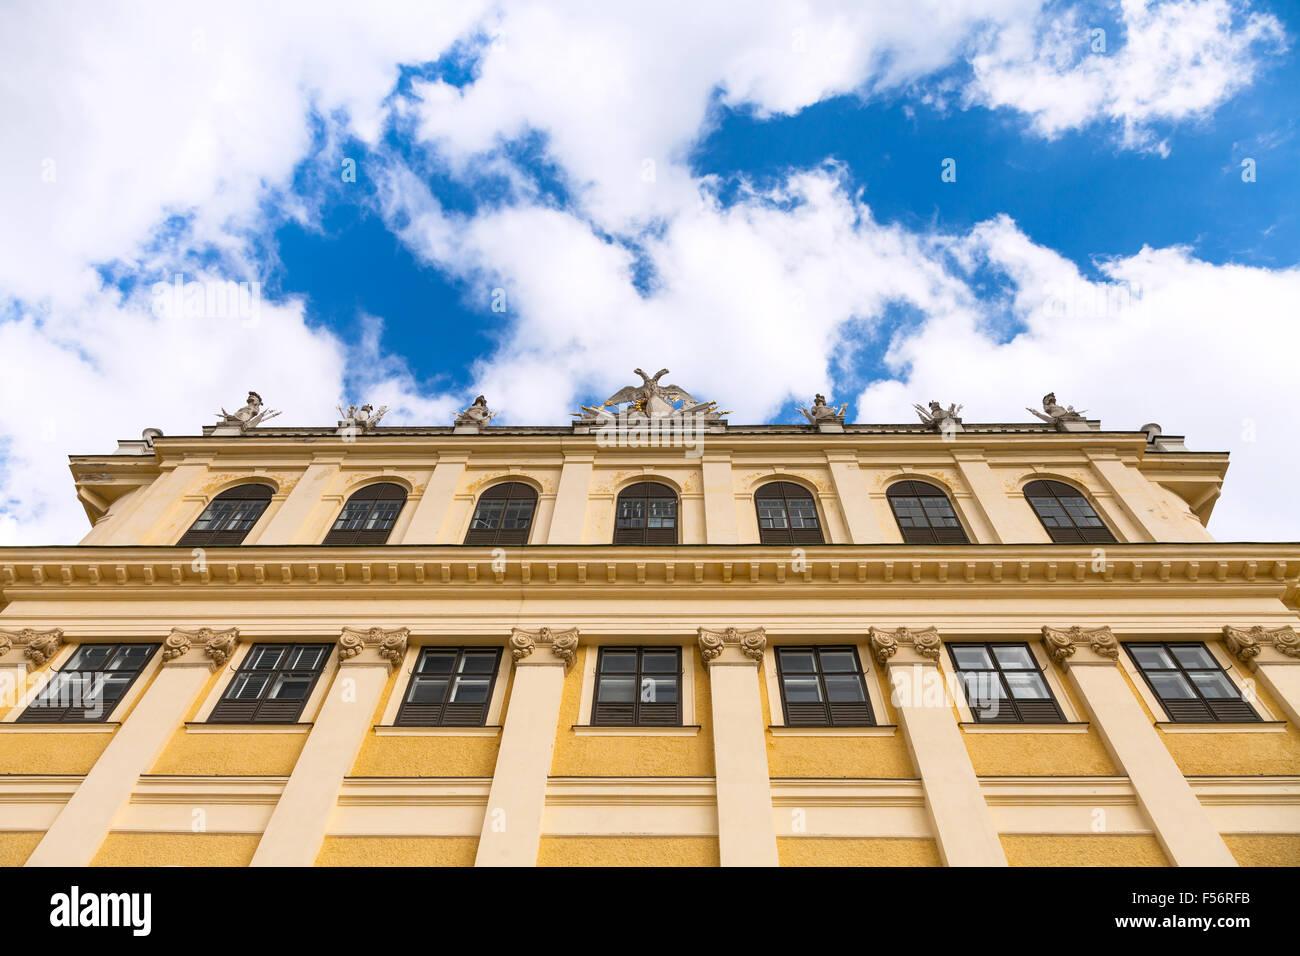 travel to Vienna city - facade of Schloss Schonbrunn palace and sky, Vienna, Austria - Stock Image